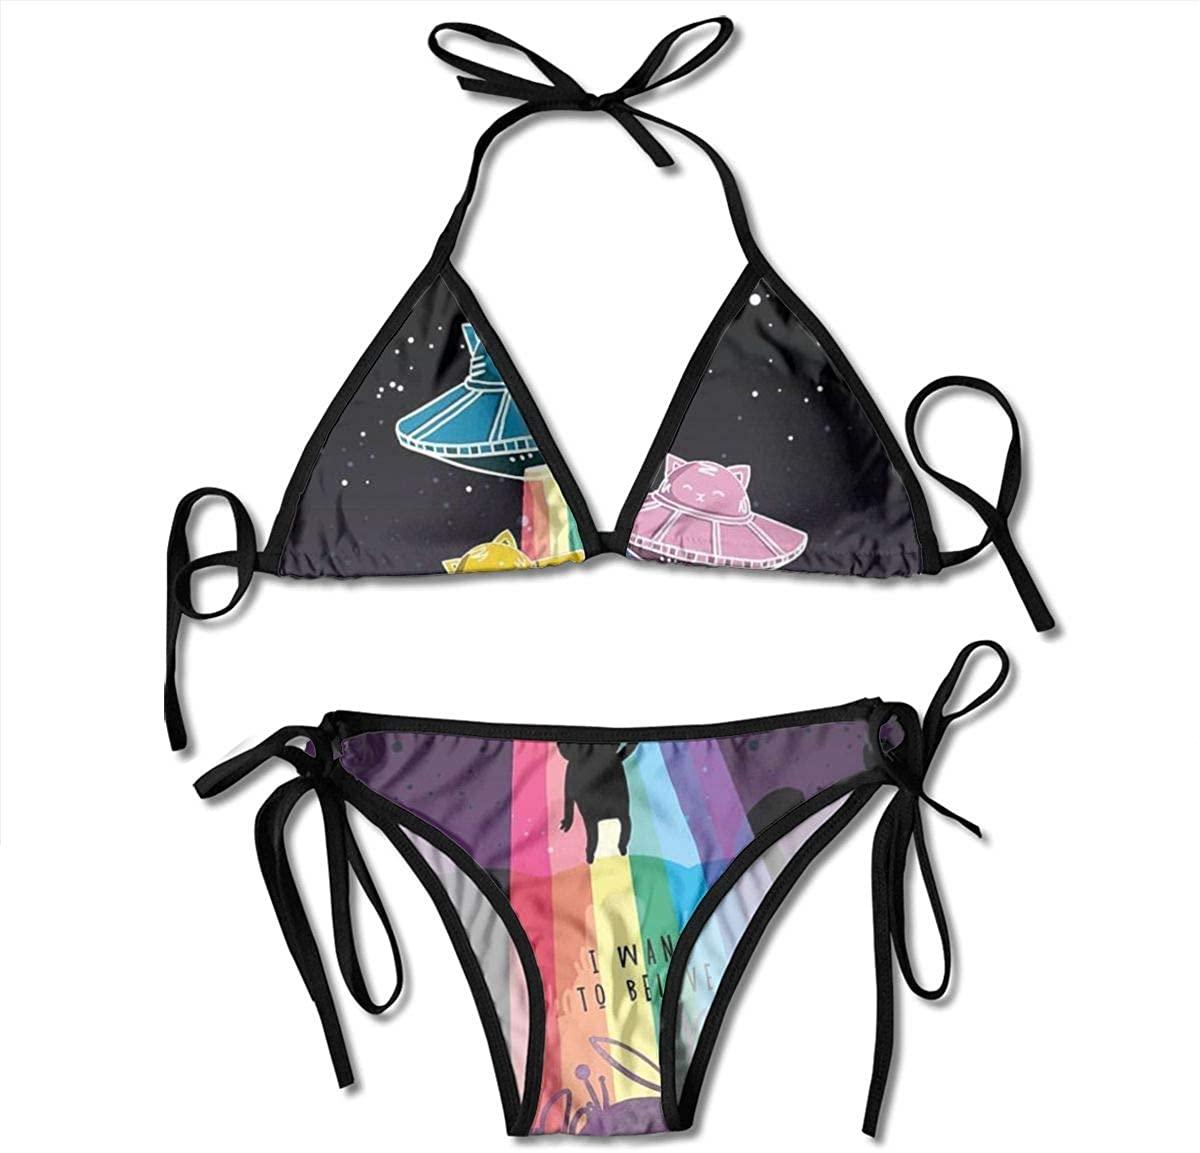 Women's String Triangle Bikini Set Two Piece Cartoon UFO Swimsuit Black